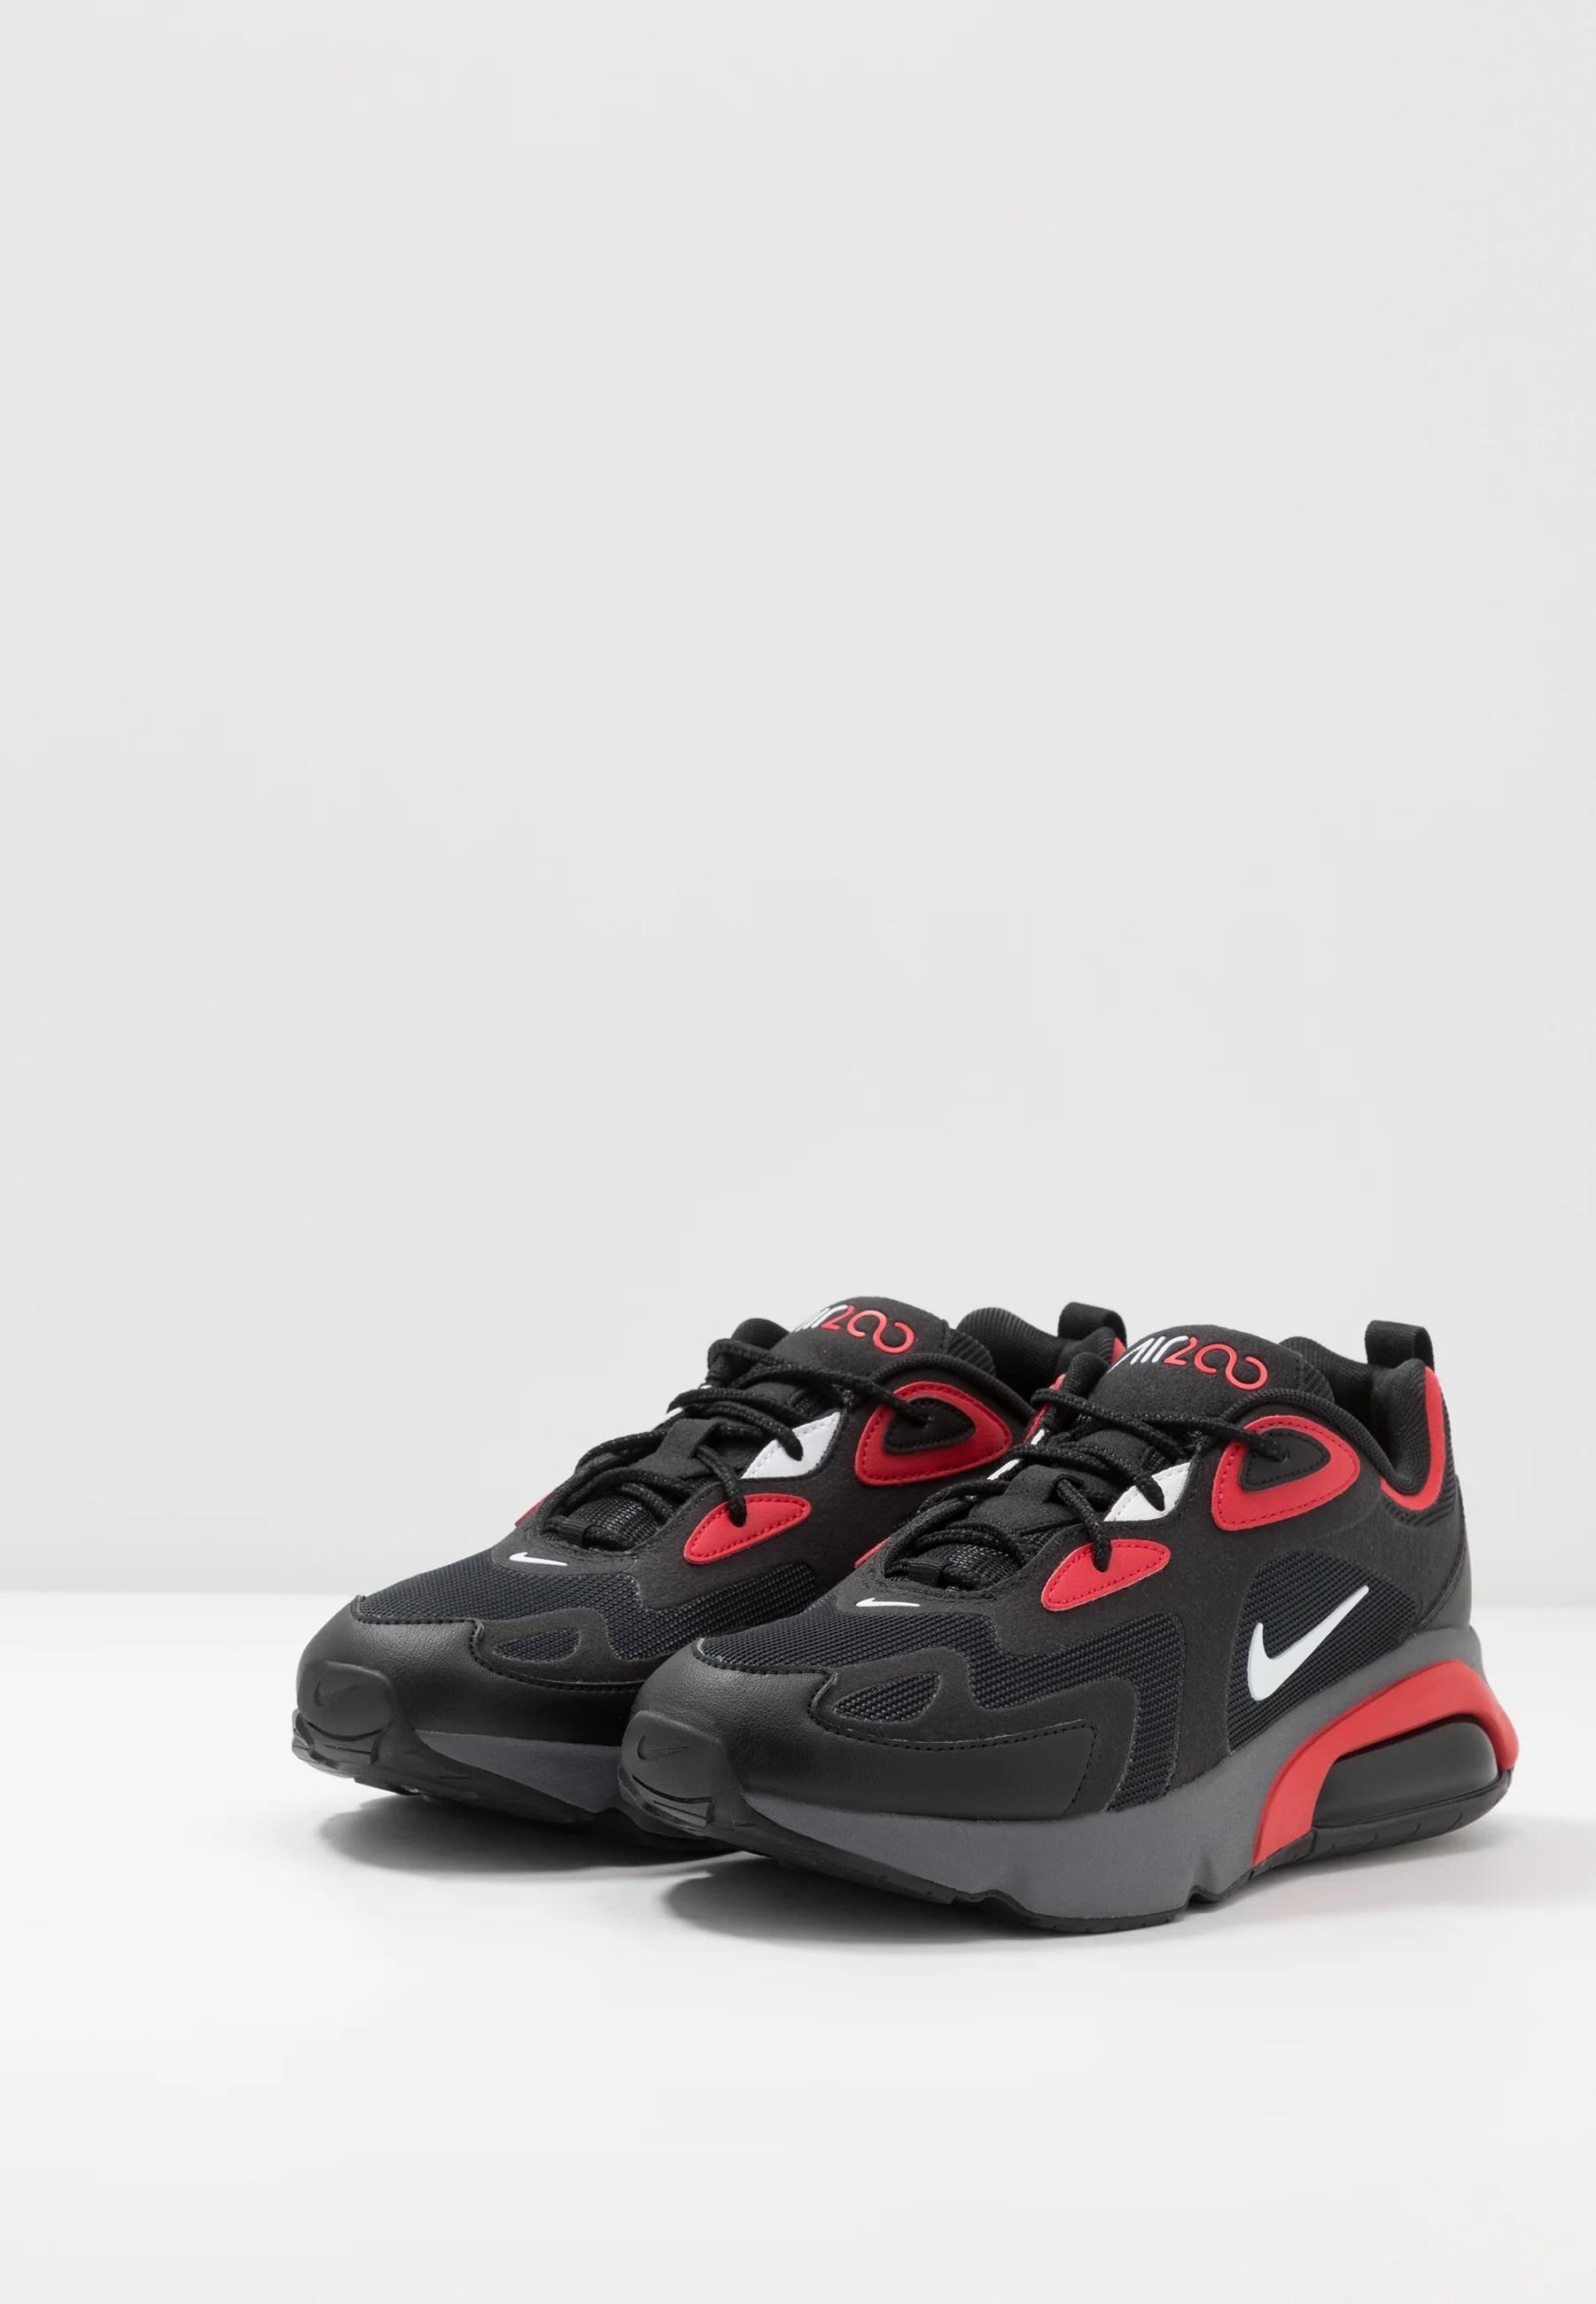 air max 200 sneaker low black white university red dark grey